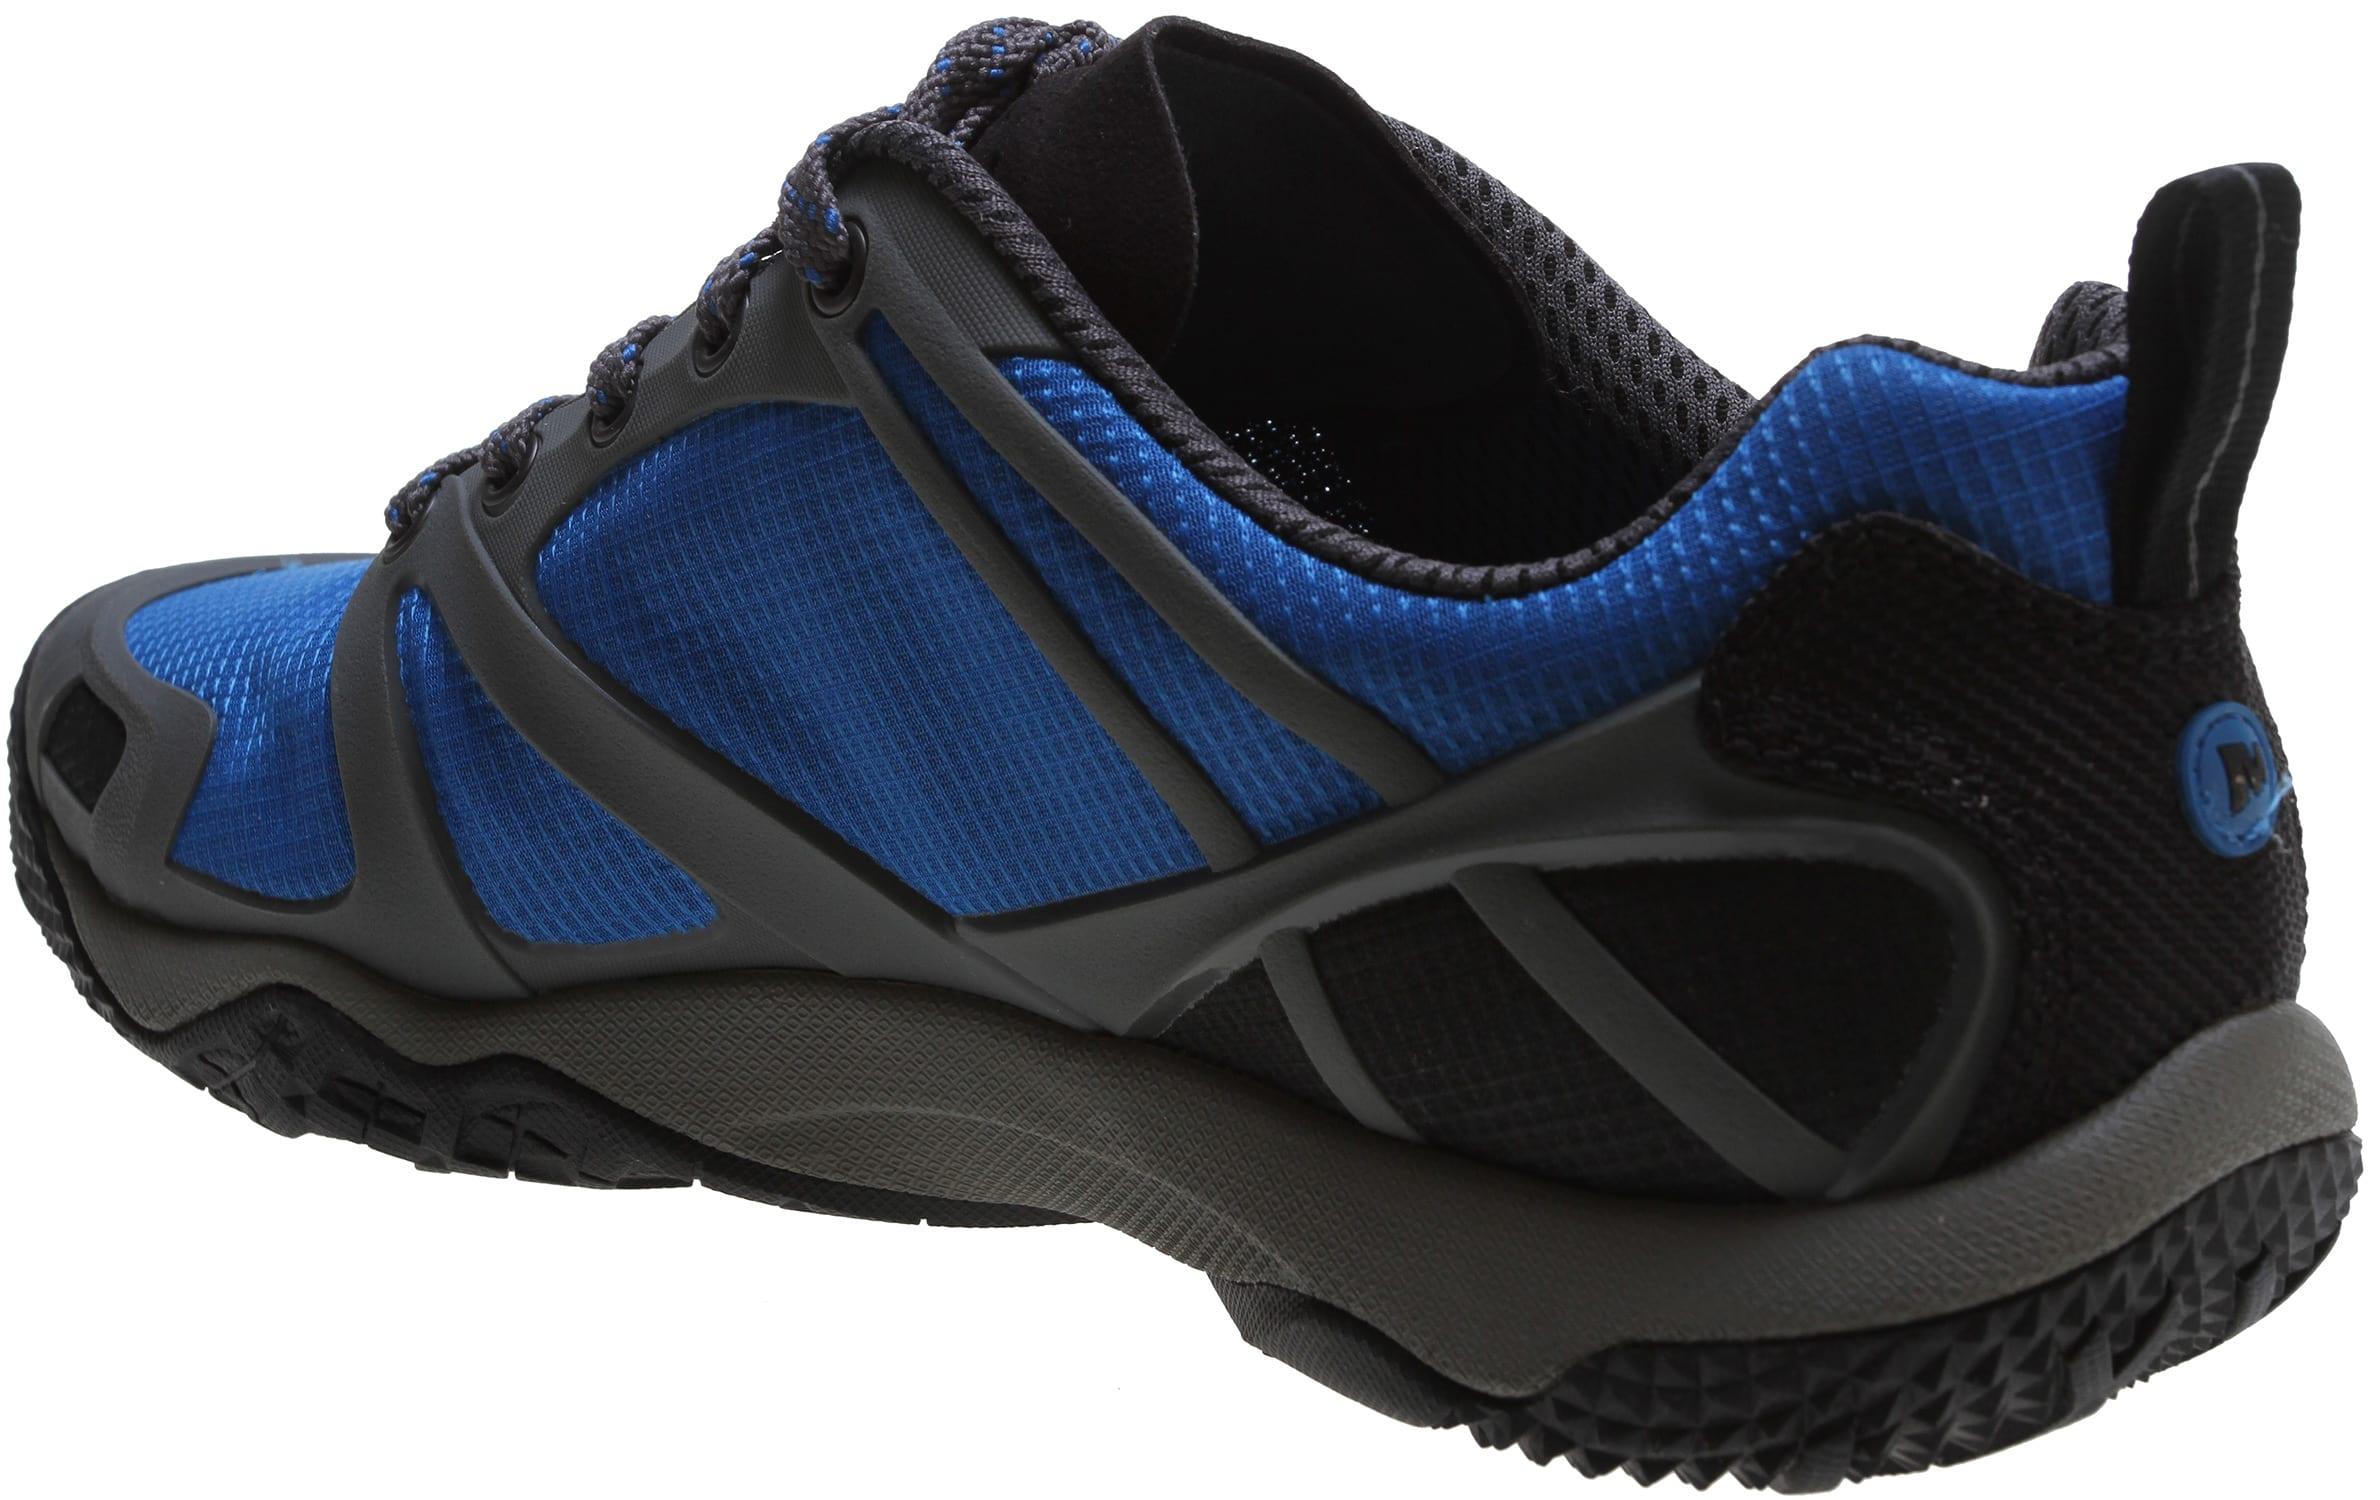 8aa4f1ab672d Merrell Proterra Sport Hiking Shoes - thumbnail 3